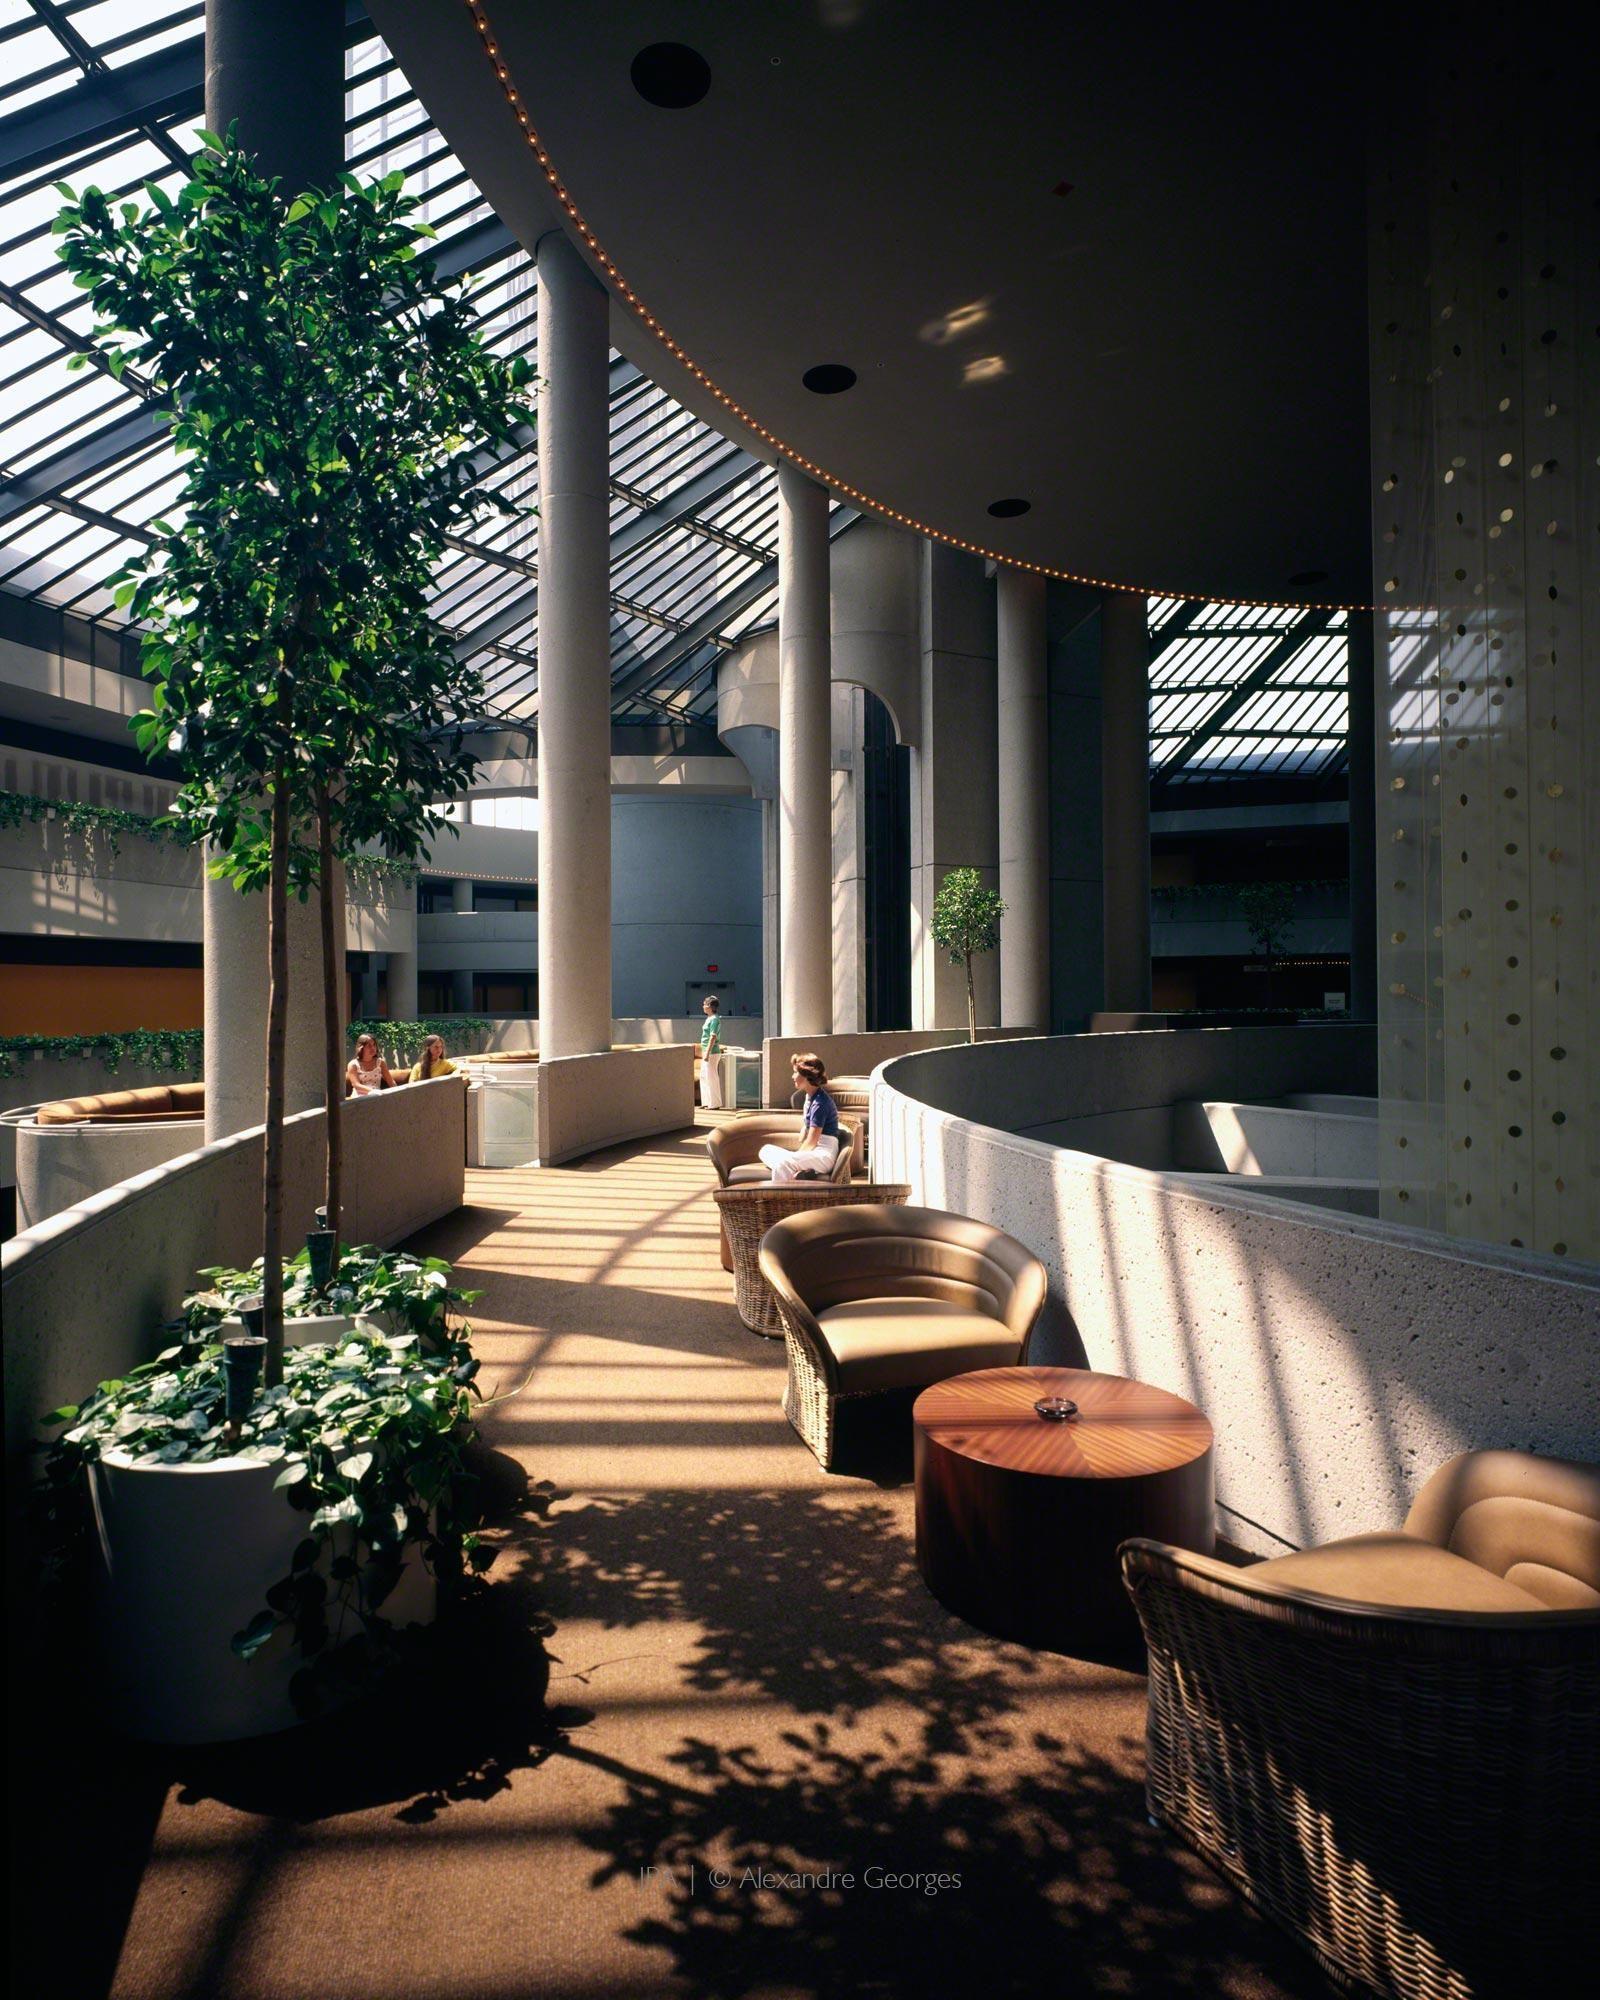 Hotels With Kitchens Atlanta